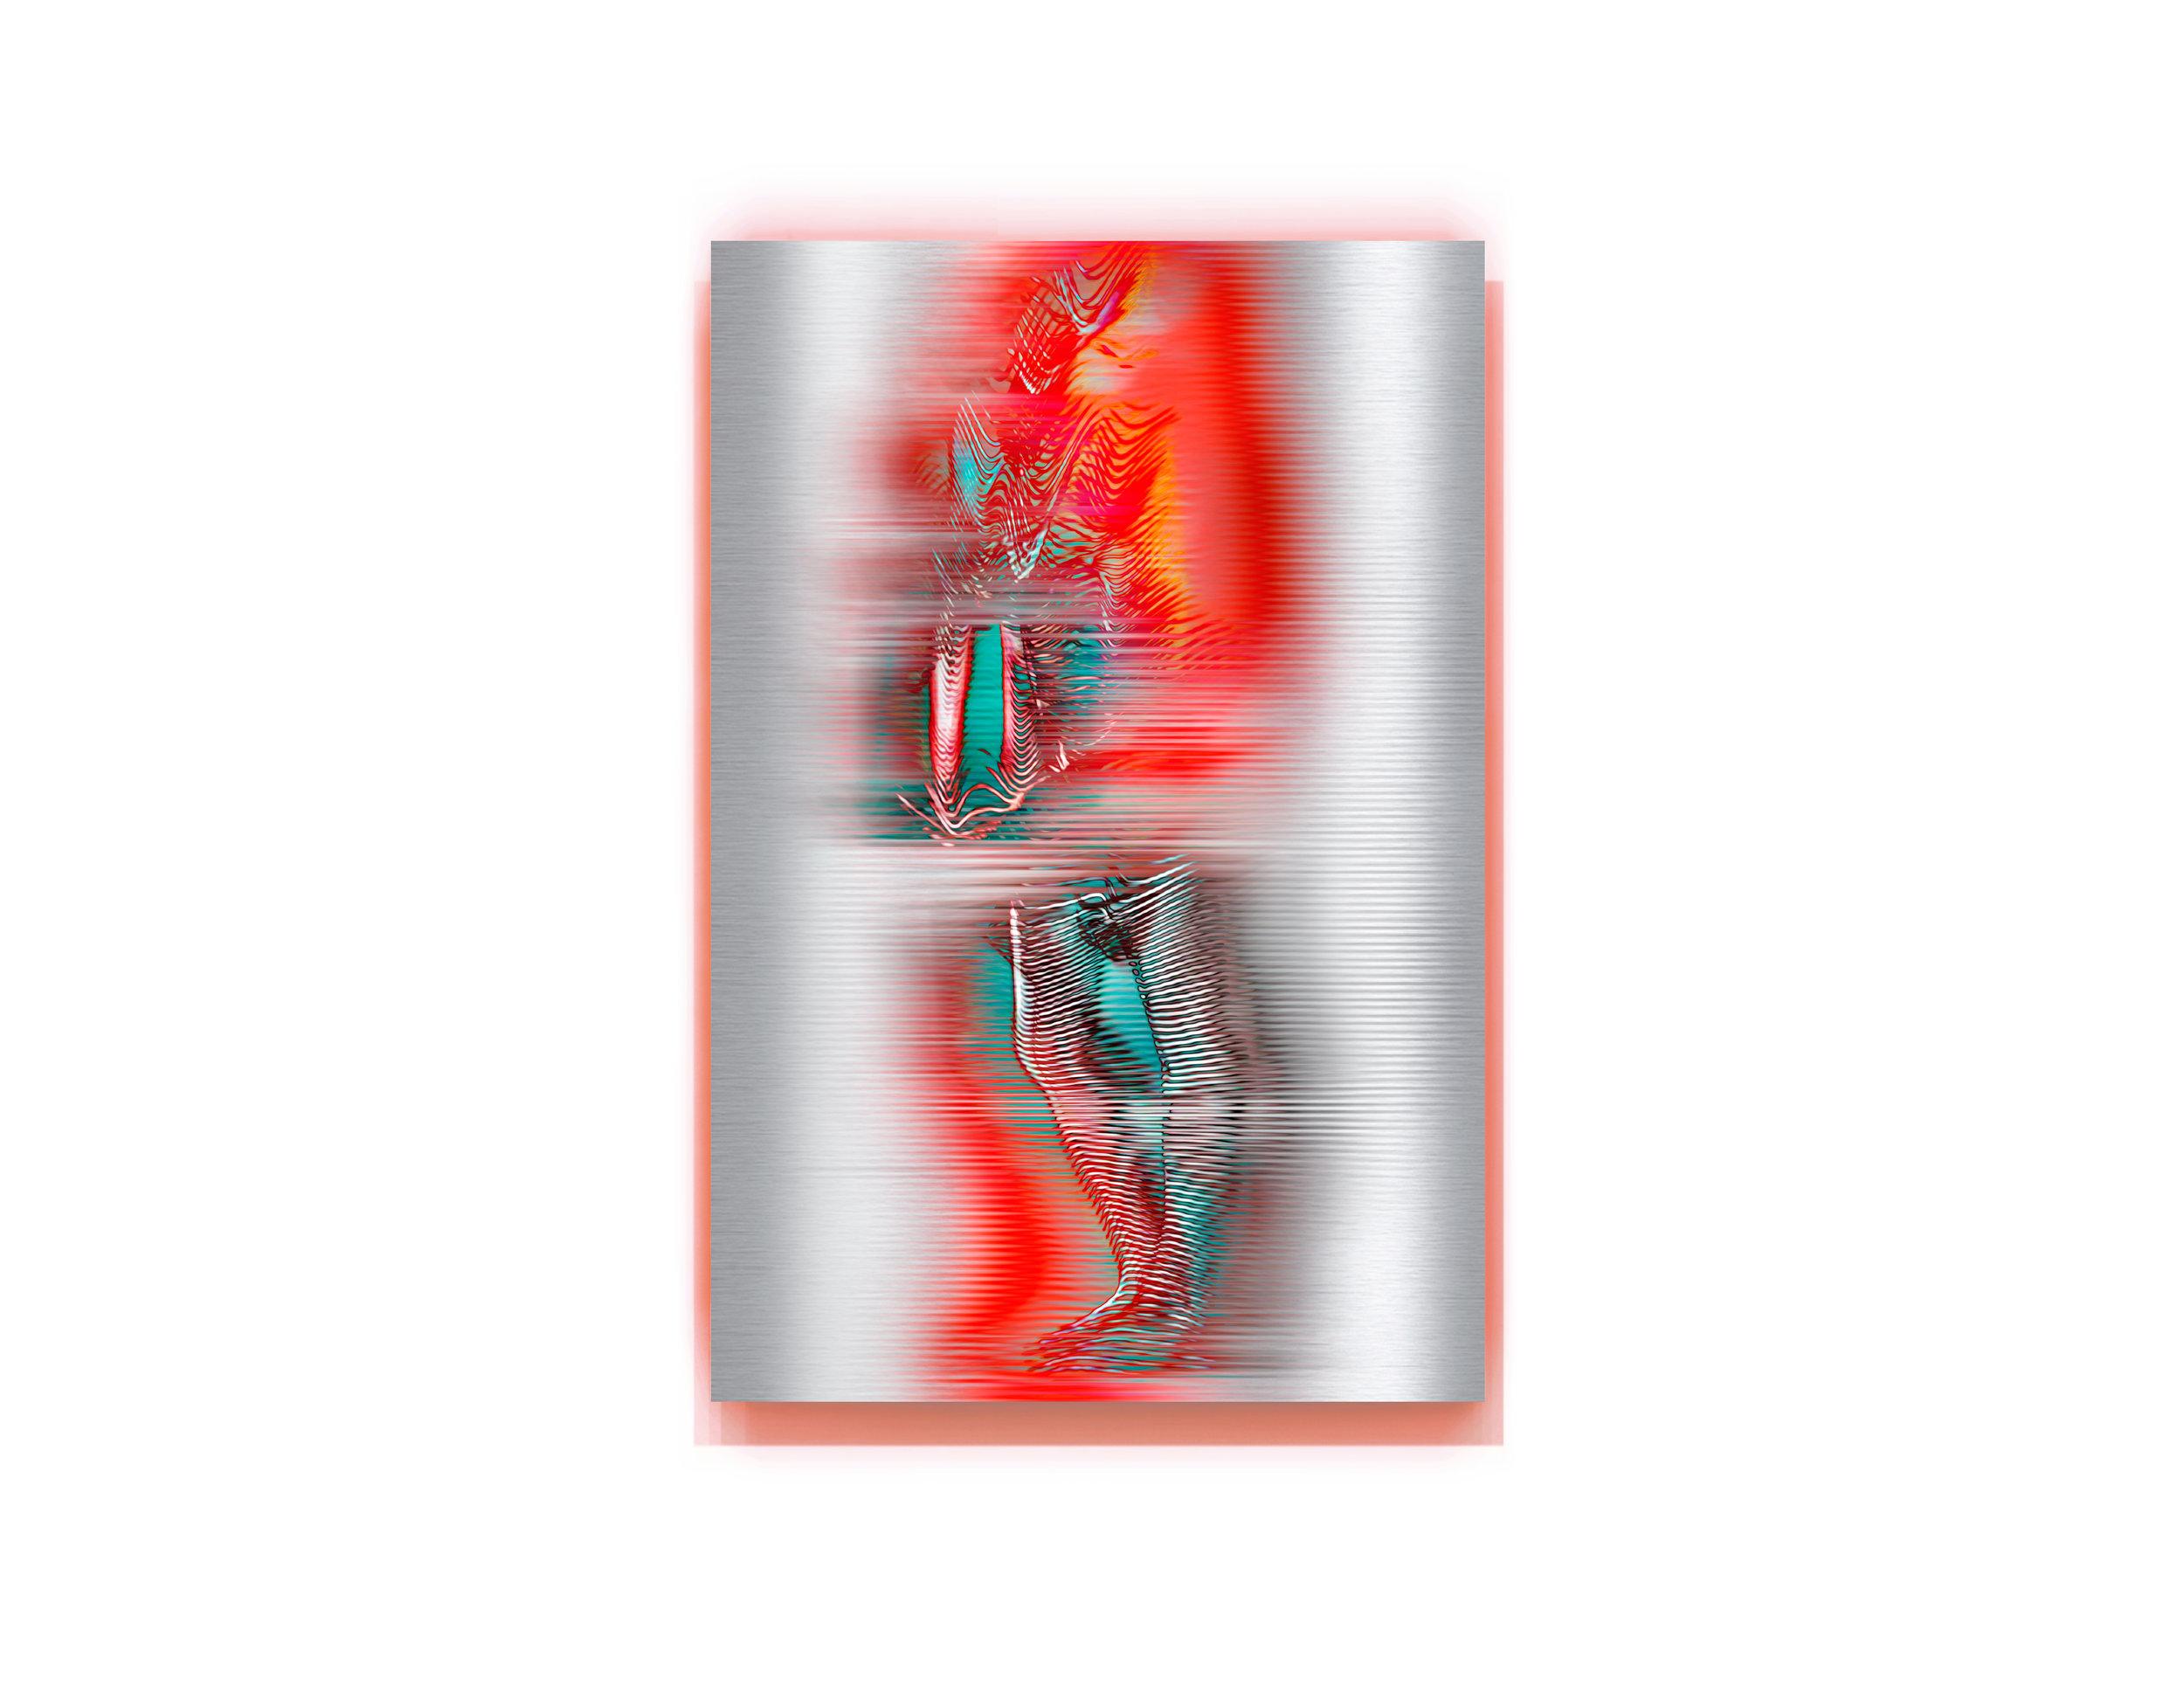 Somnambulant-3,-2014,-pigment-and-enamel-on-aluminium,-120cm-x-80cm---1.jpg